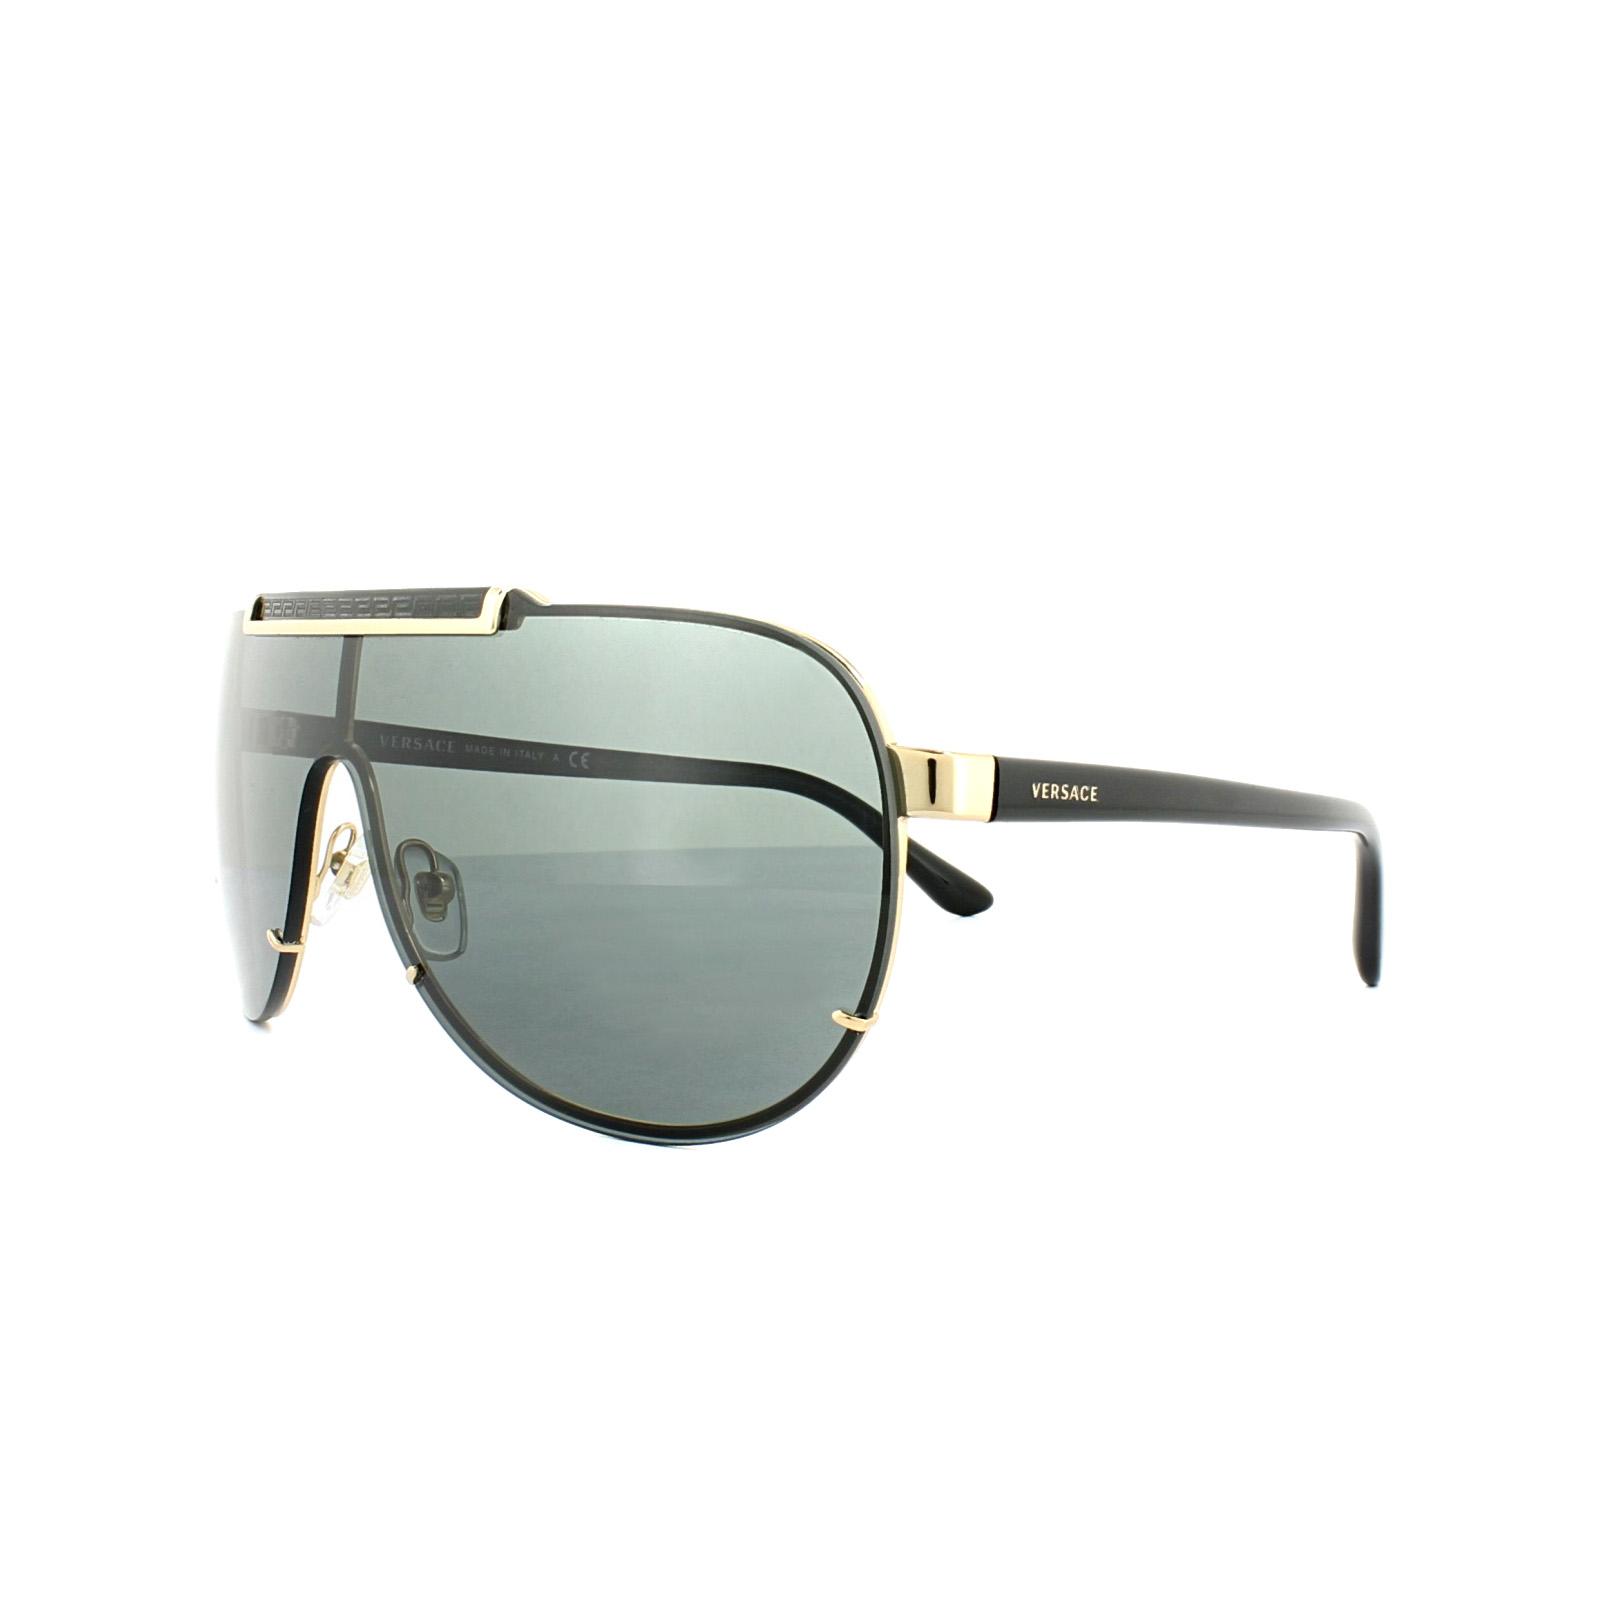 e5c0acab587f Sentinel Thumbnail 1. Sentinel Versace Sunglasses 2140 100287 Gold Grey